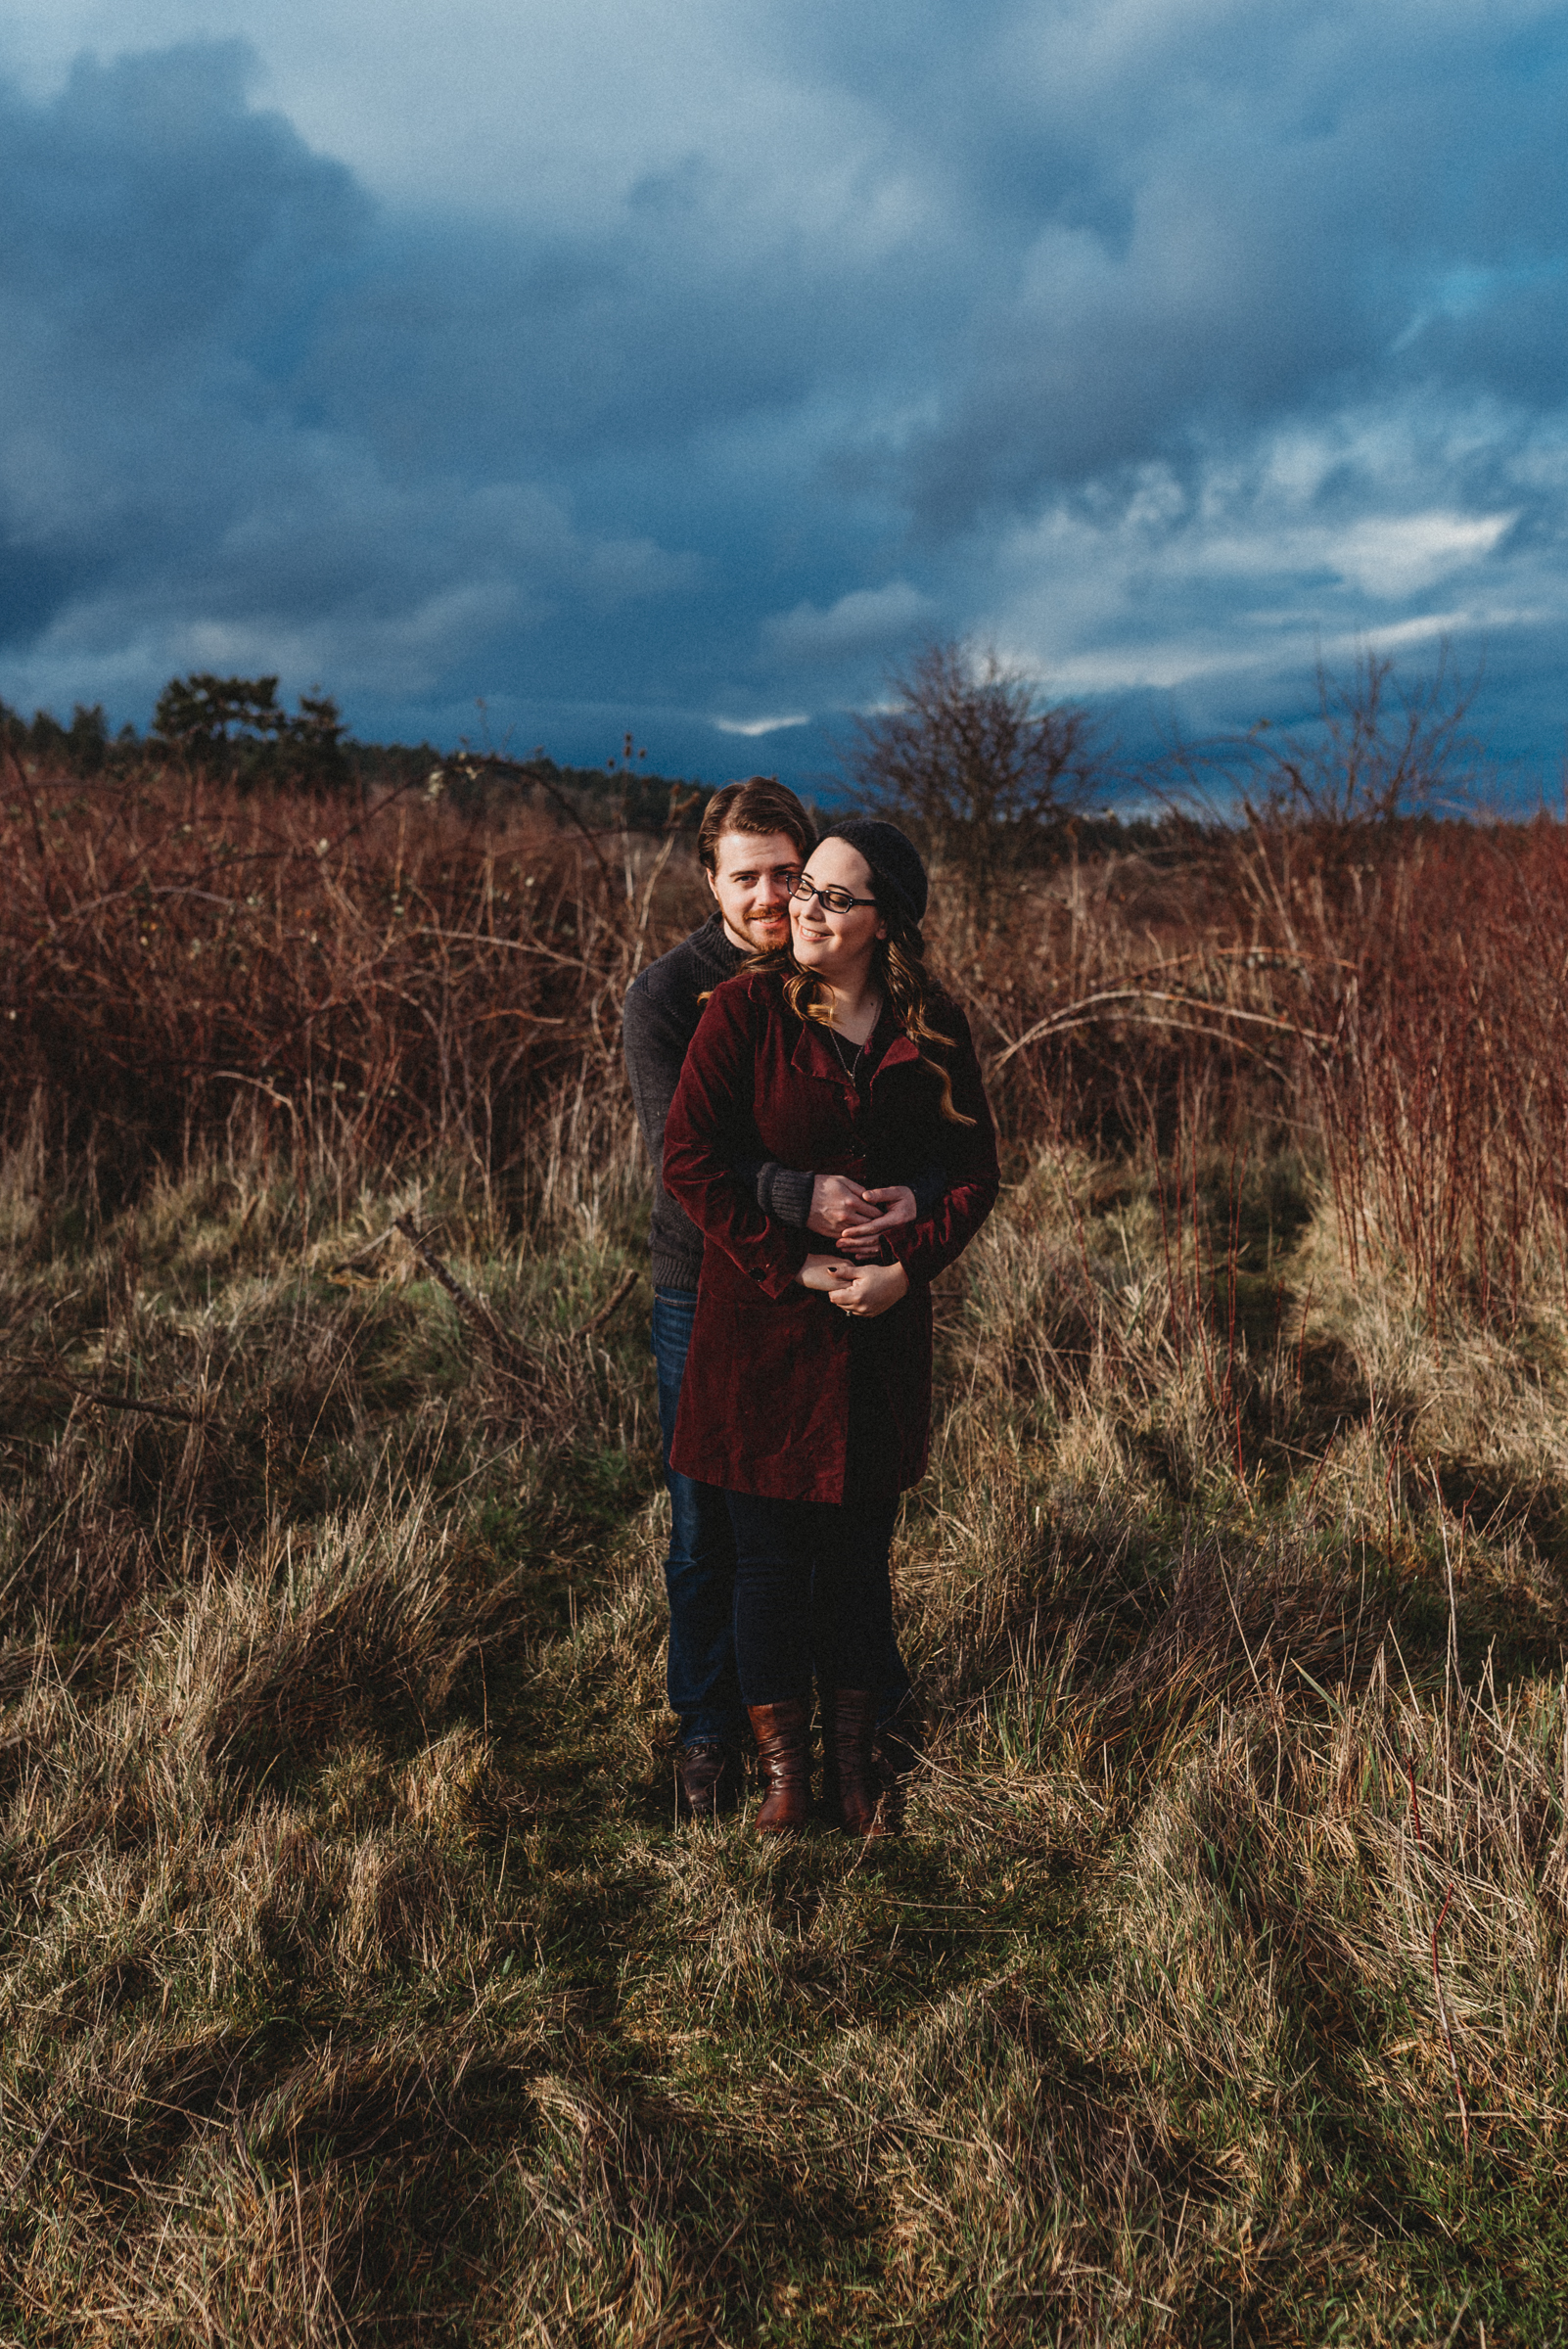 Nicola_Reiersen_Photography_Victoria_BC_Wedding_Photographer-6.jpg